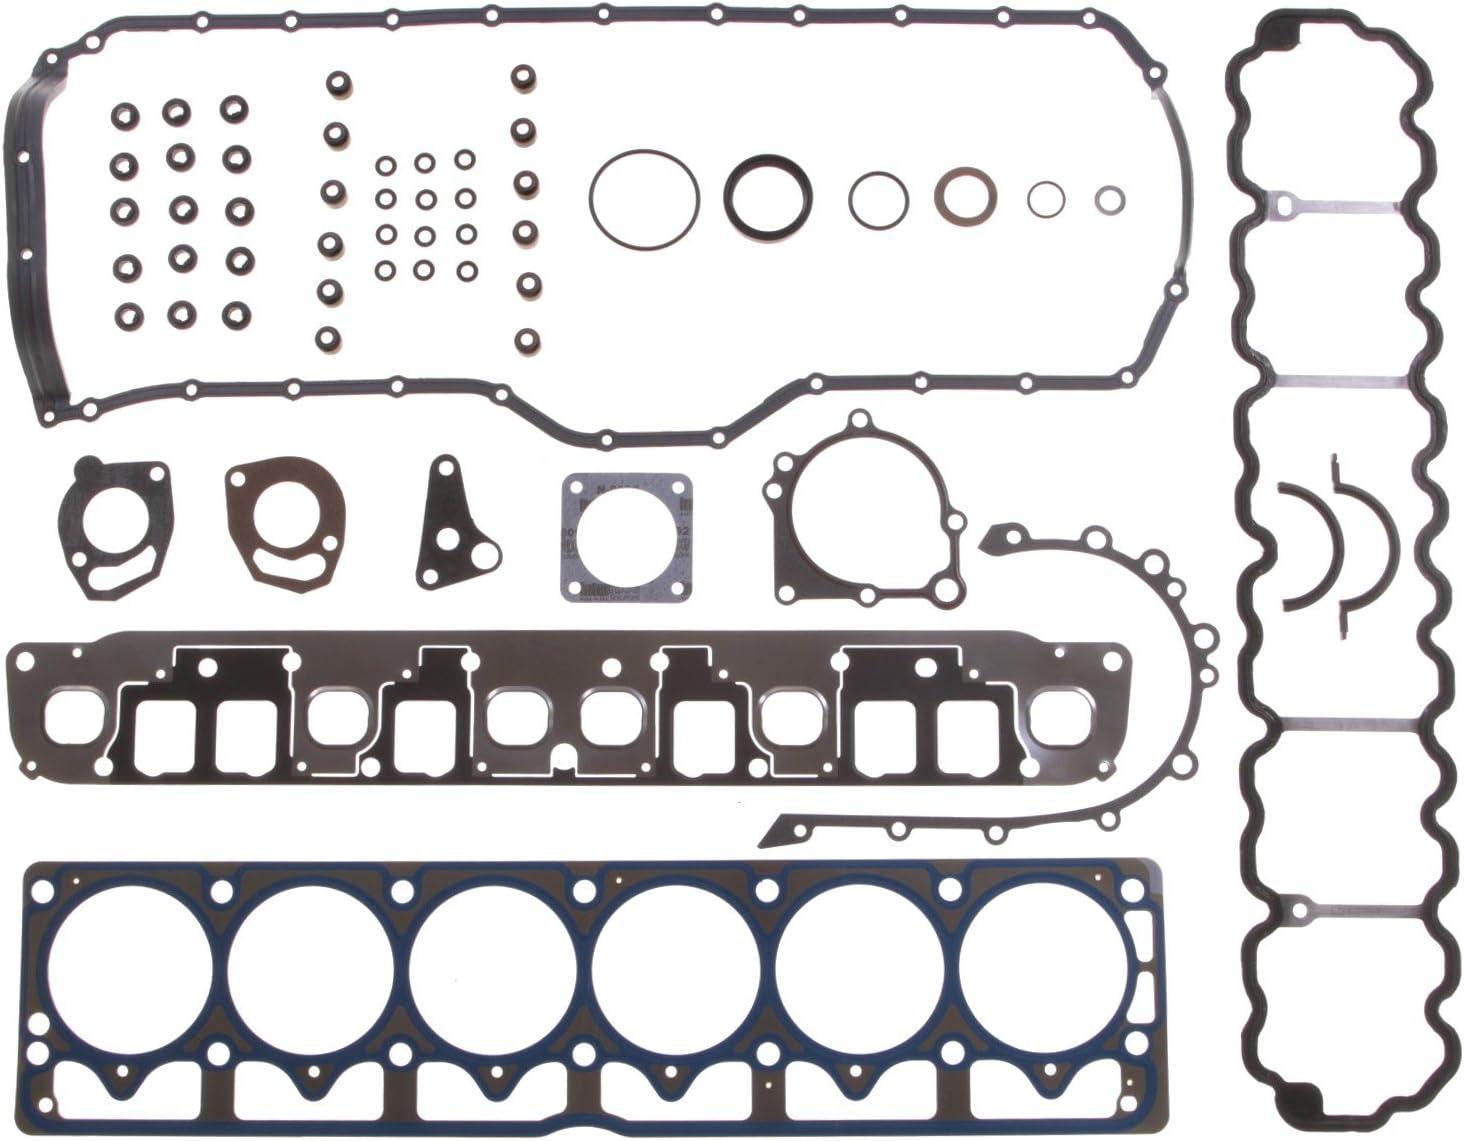 MAHLE Original 95-3567 Engine Kit Gasket Set